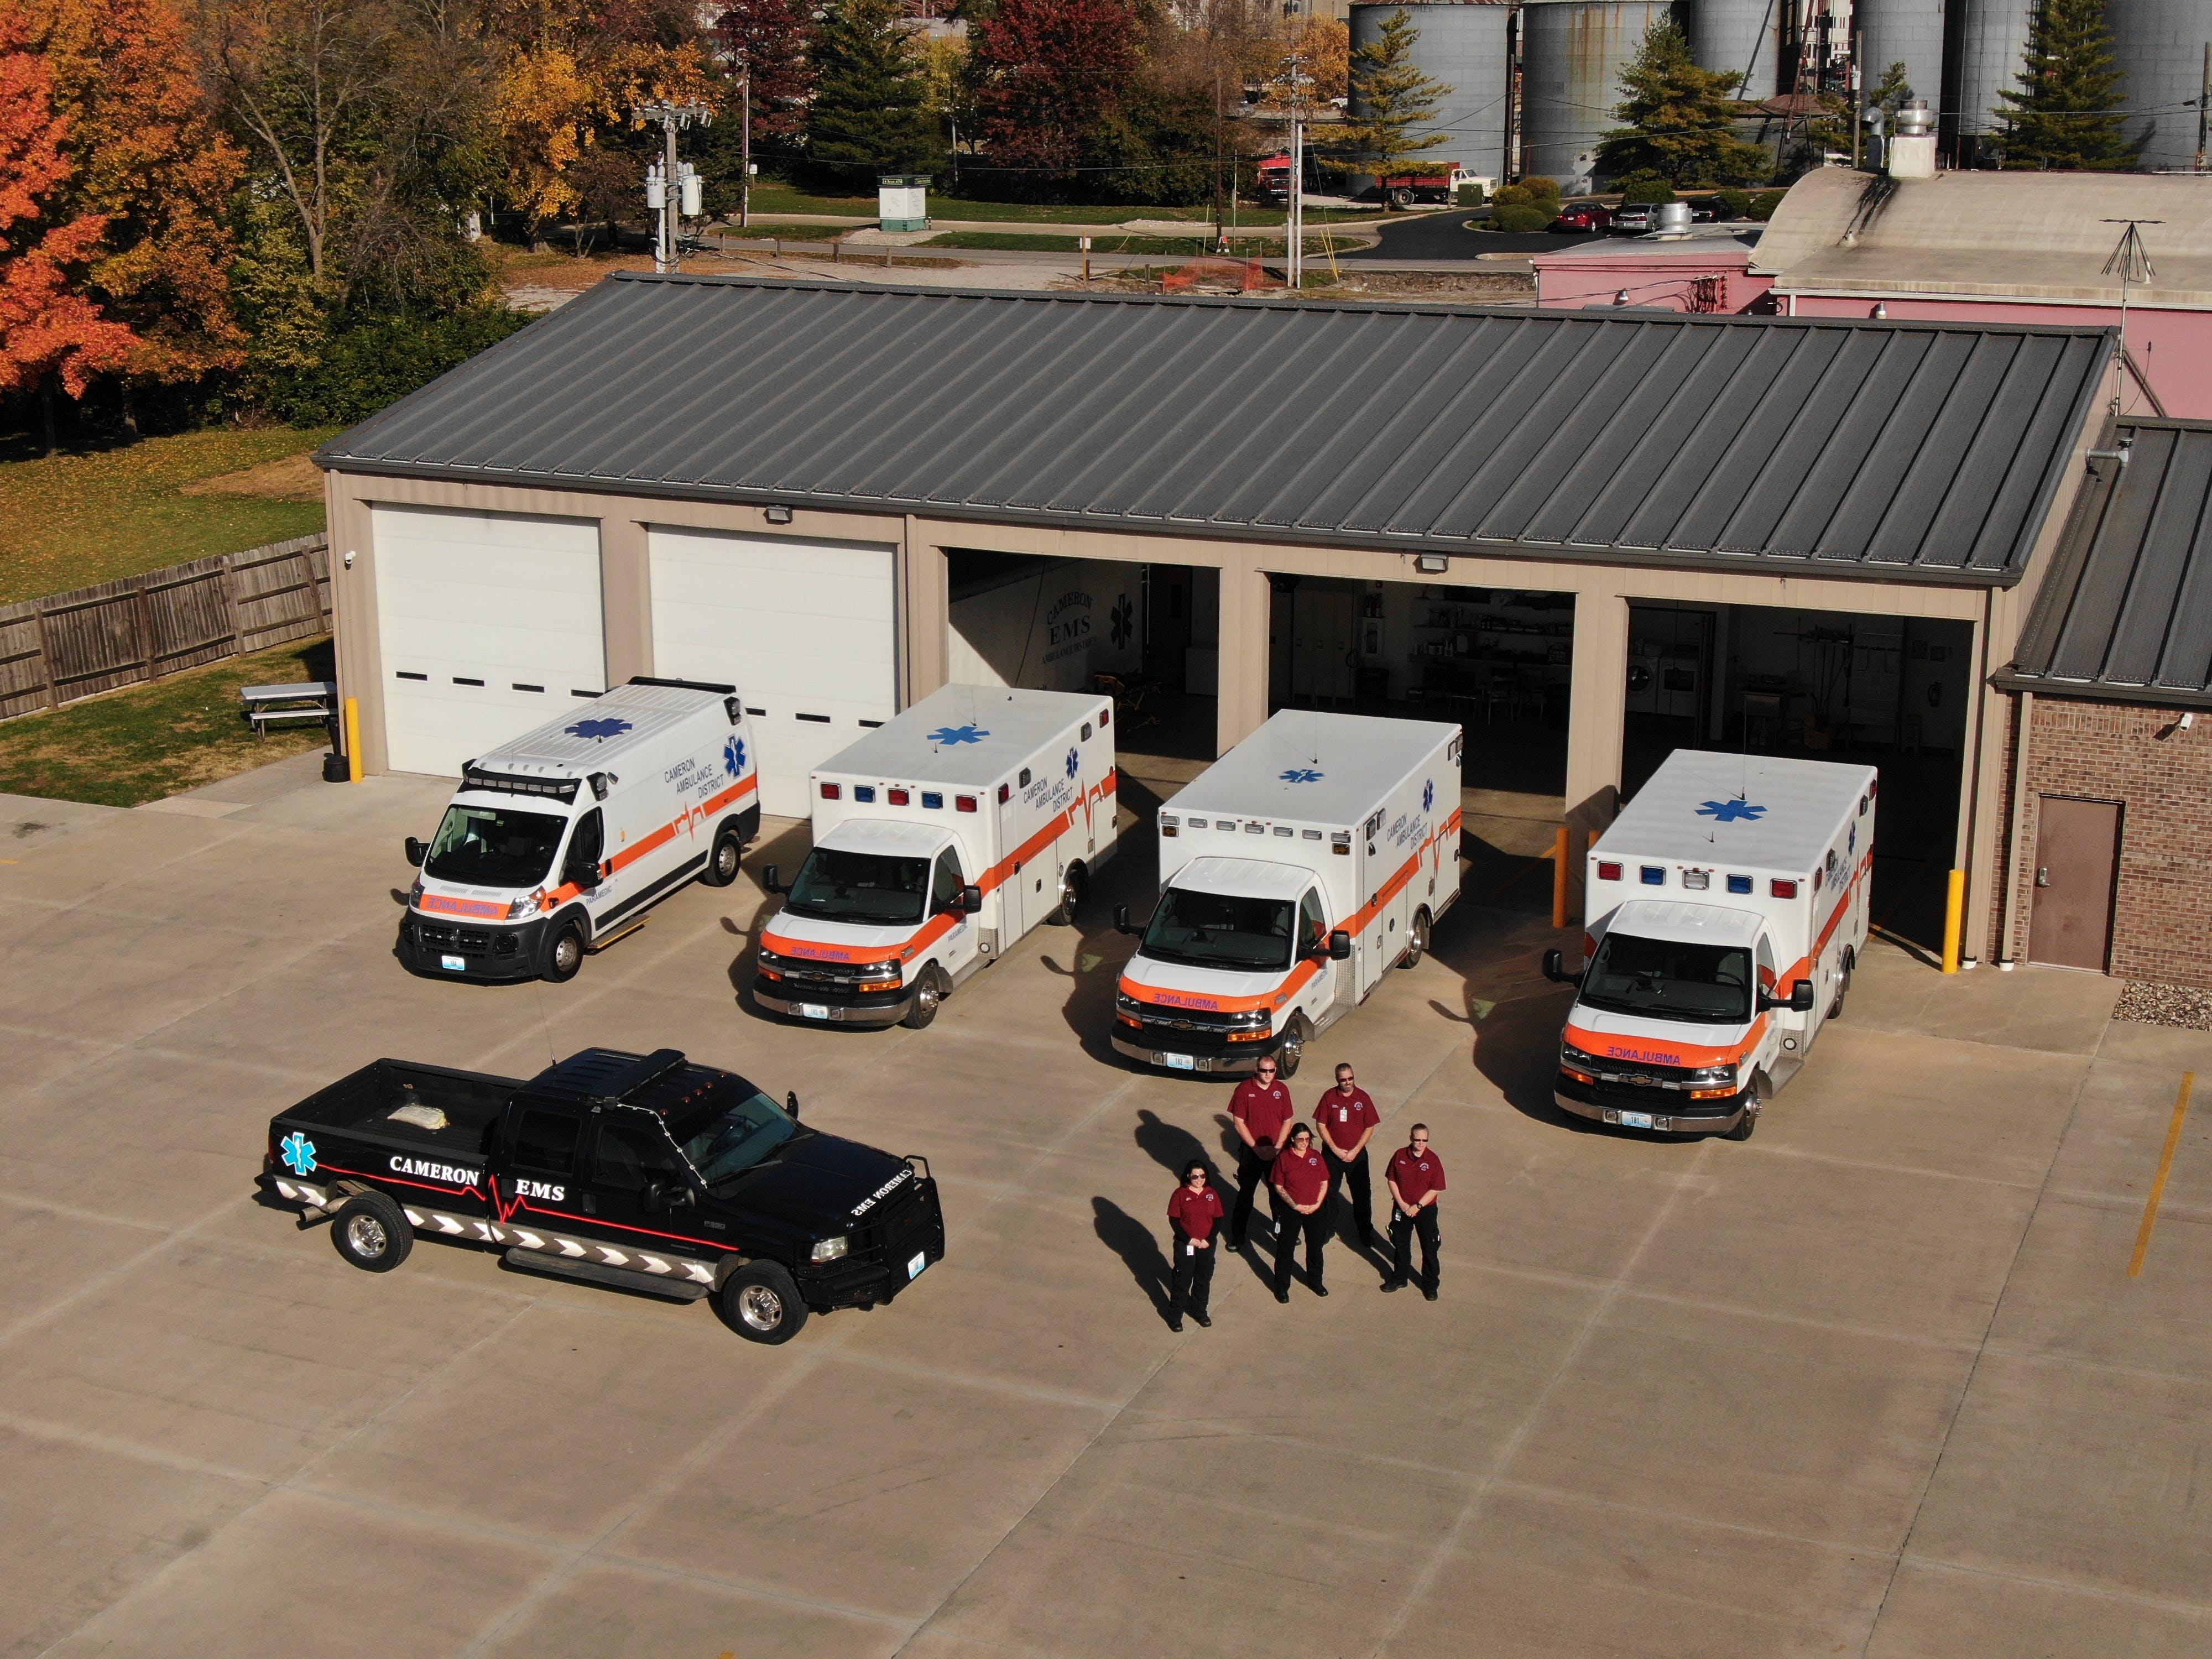 Cameron_Ambulance.JPG